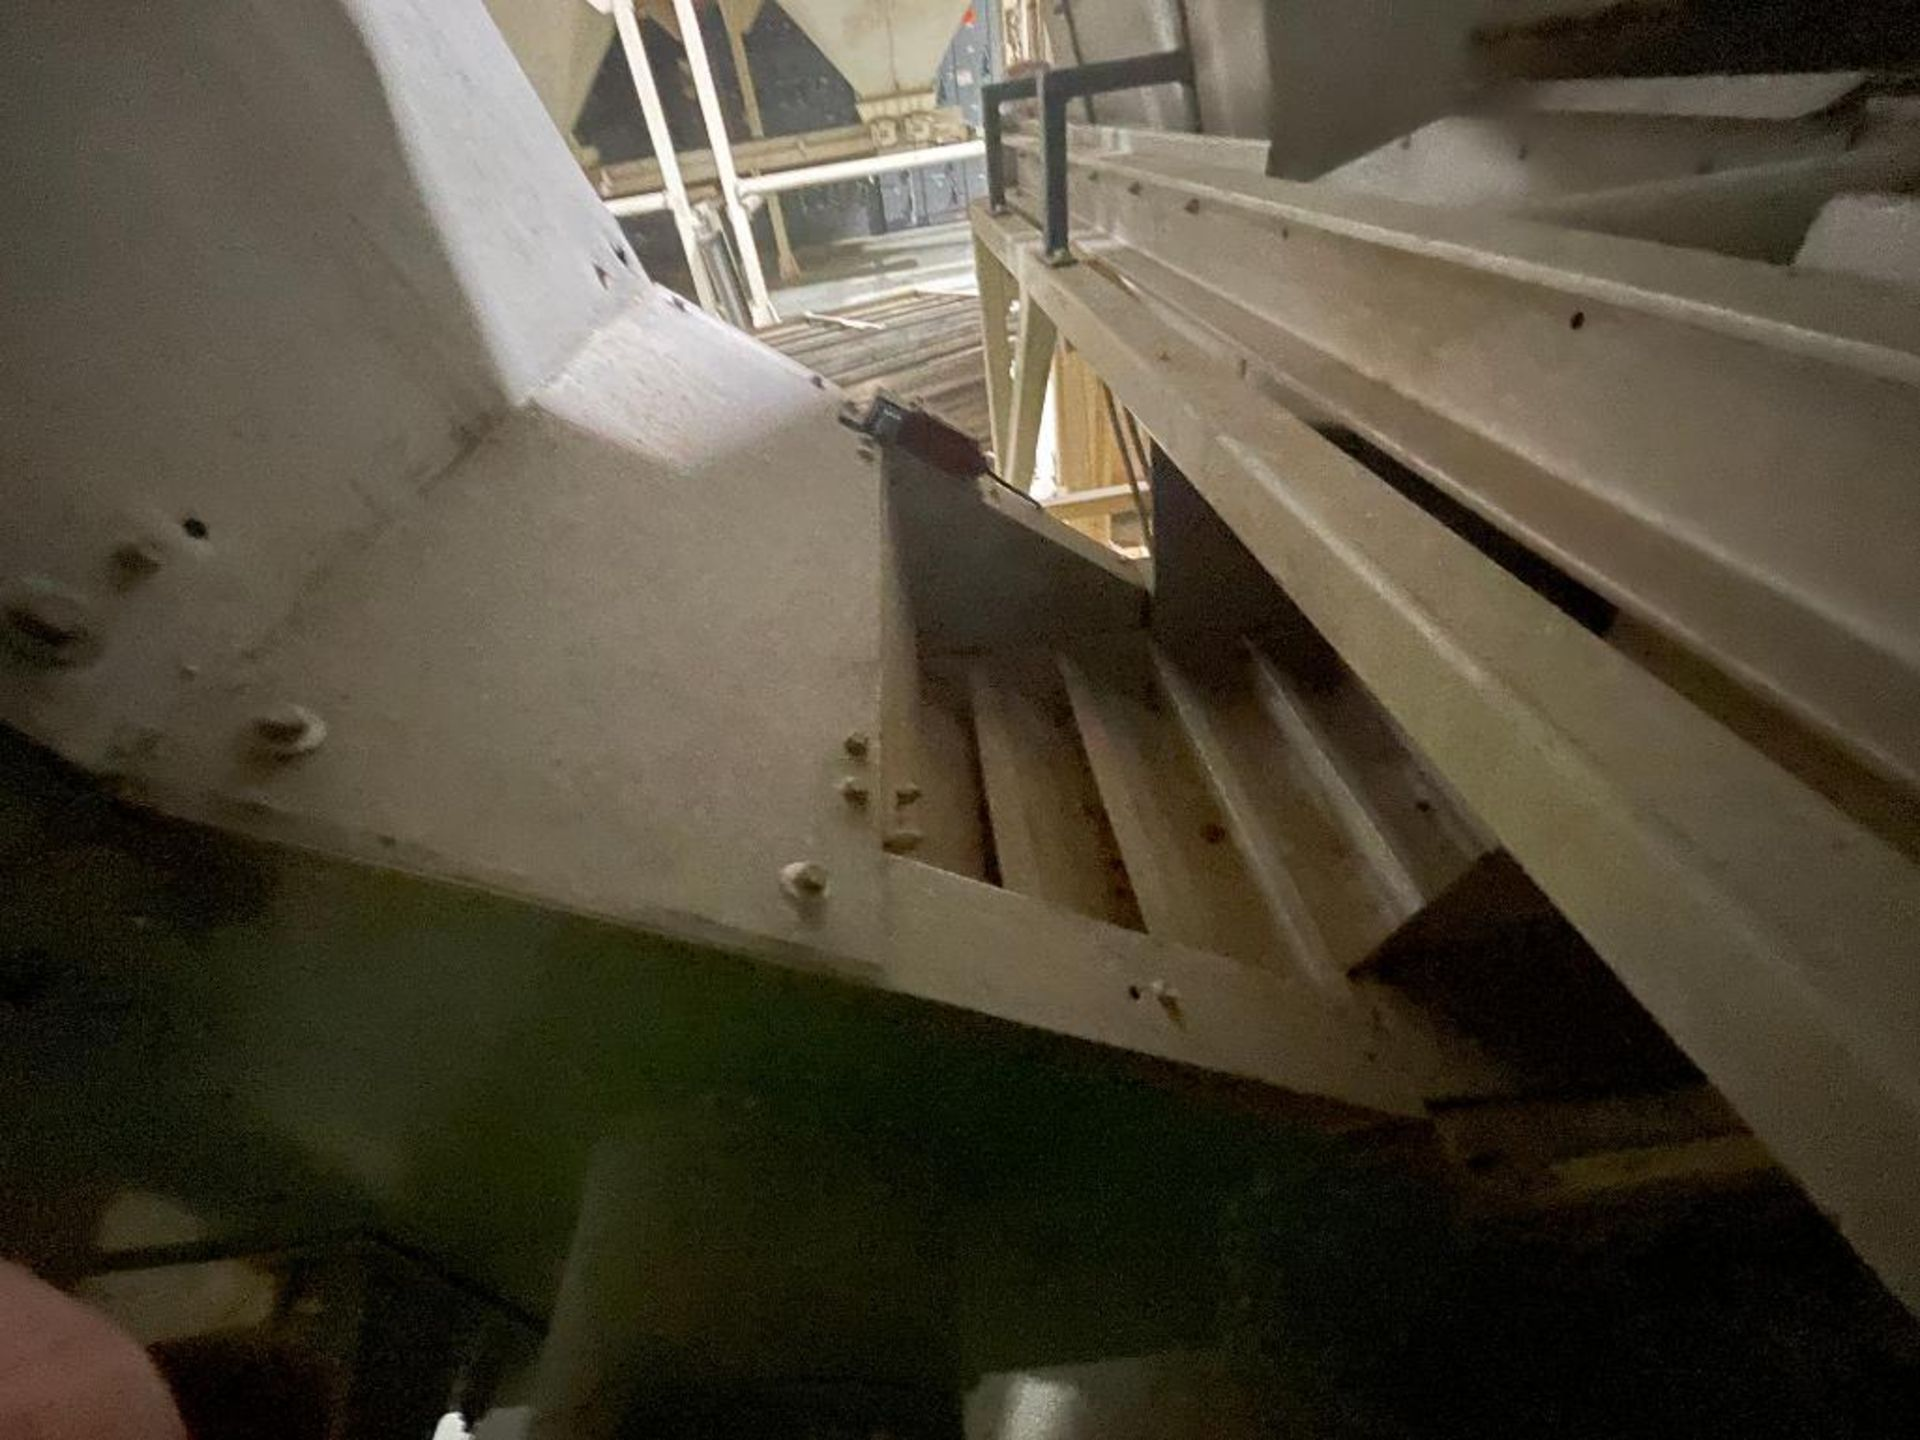 mild steel incline overlapping bucket conveyor - Image 4 of 7